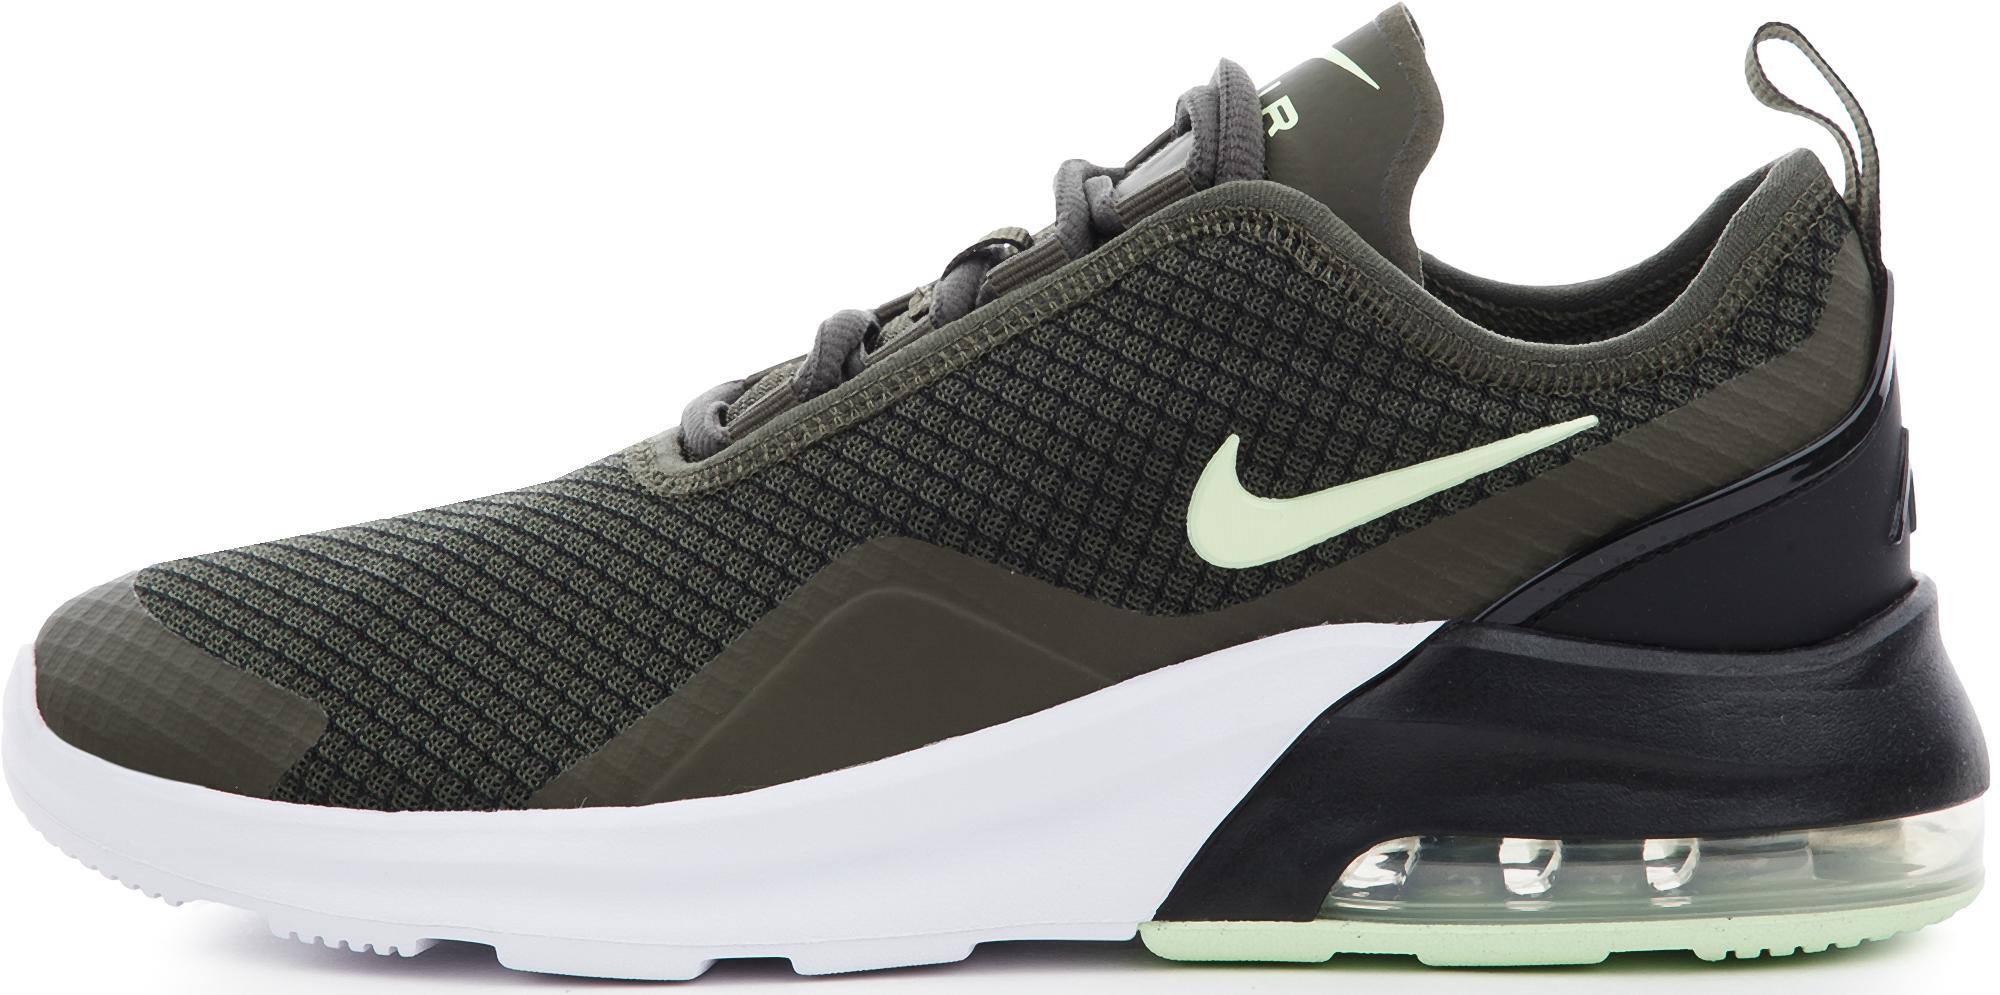 Nike Кроссовки для мальчиков Nike Air Max Motion 2, размер 39 цена